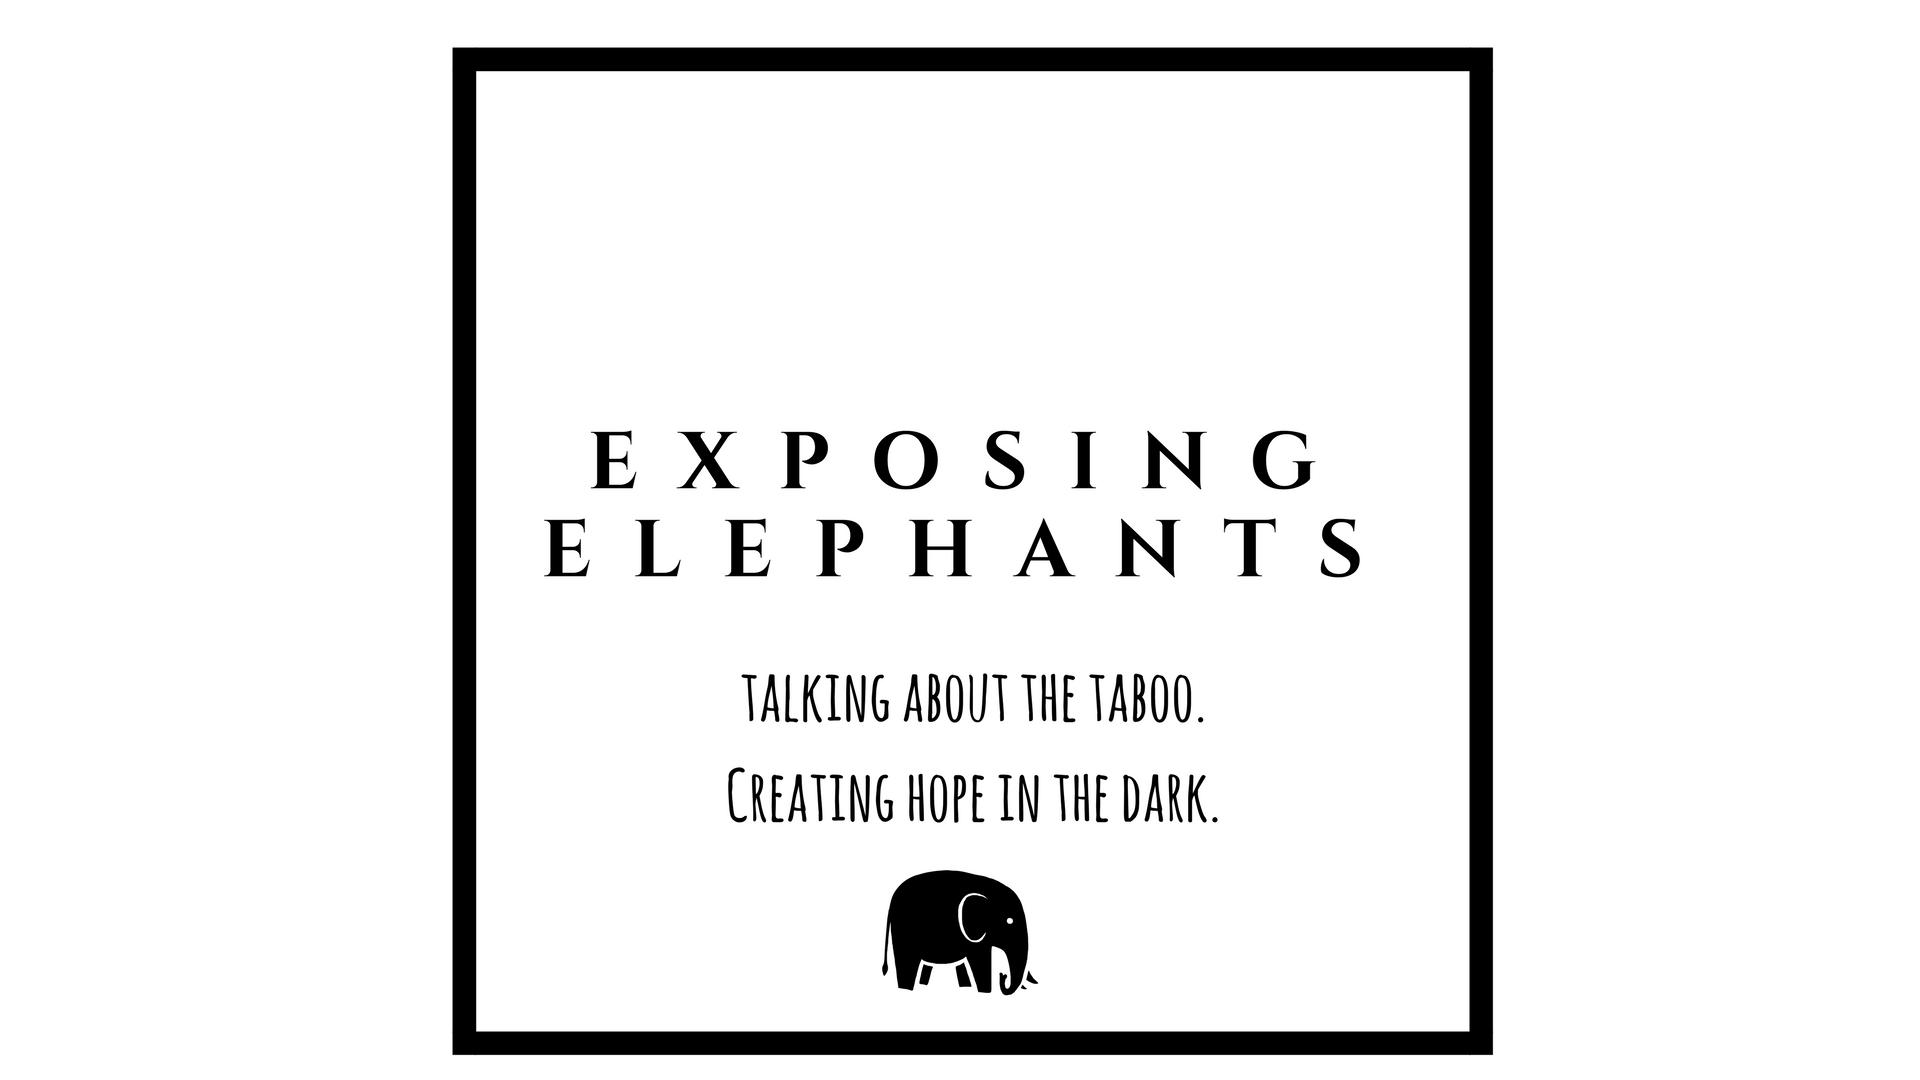 EXPOSING ELEPHANTS